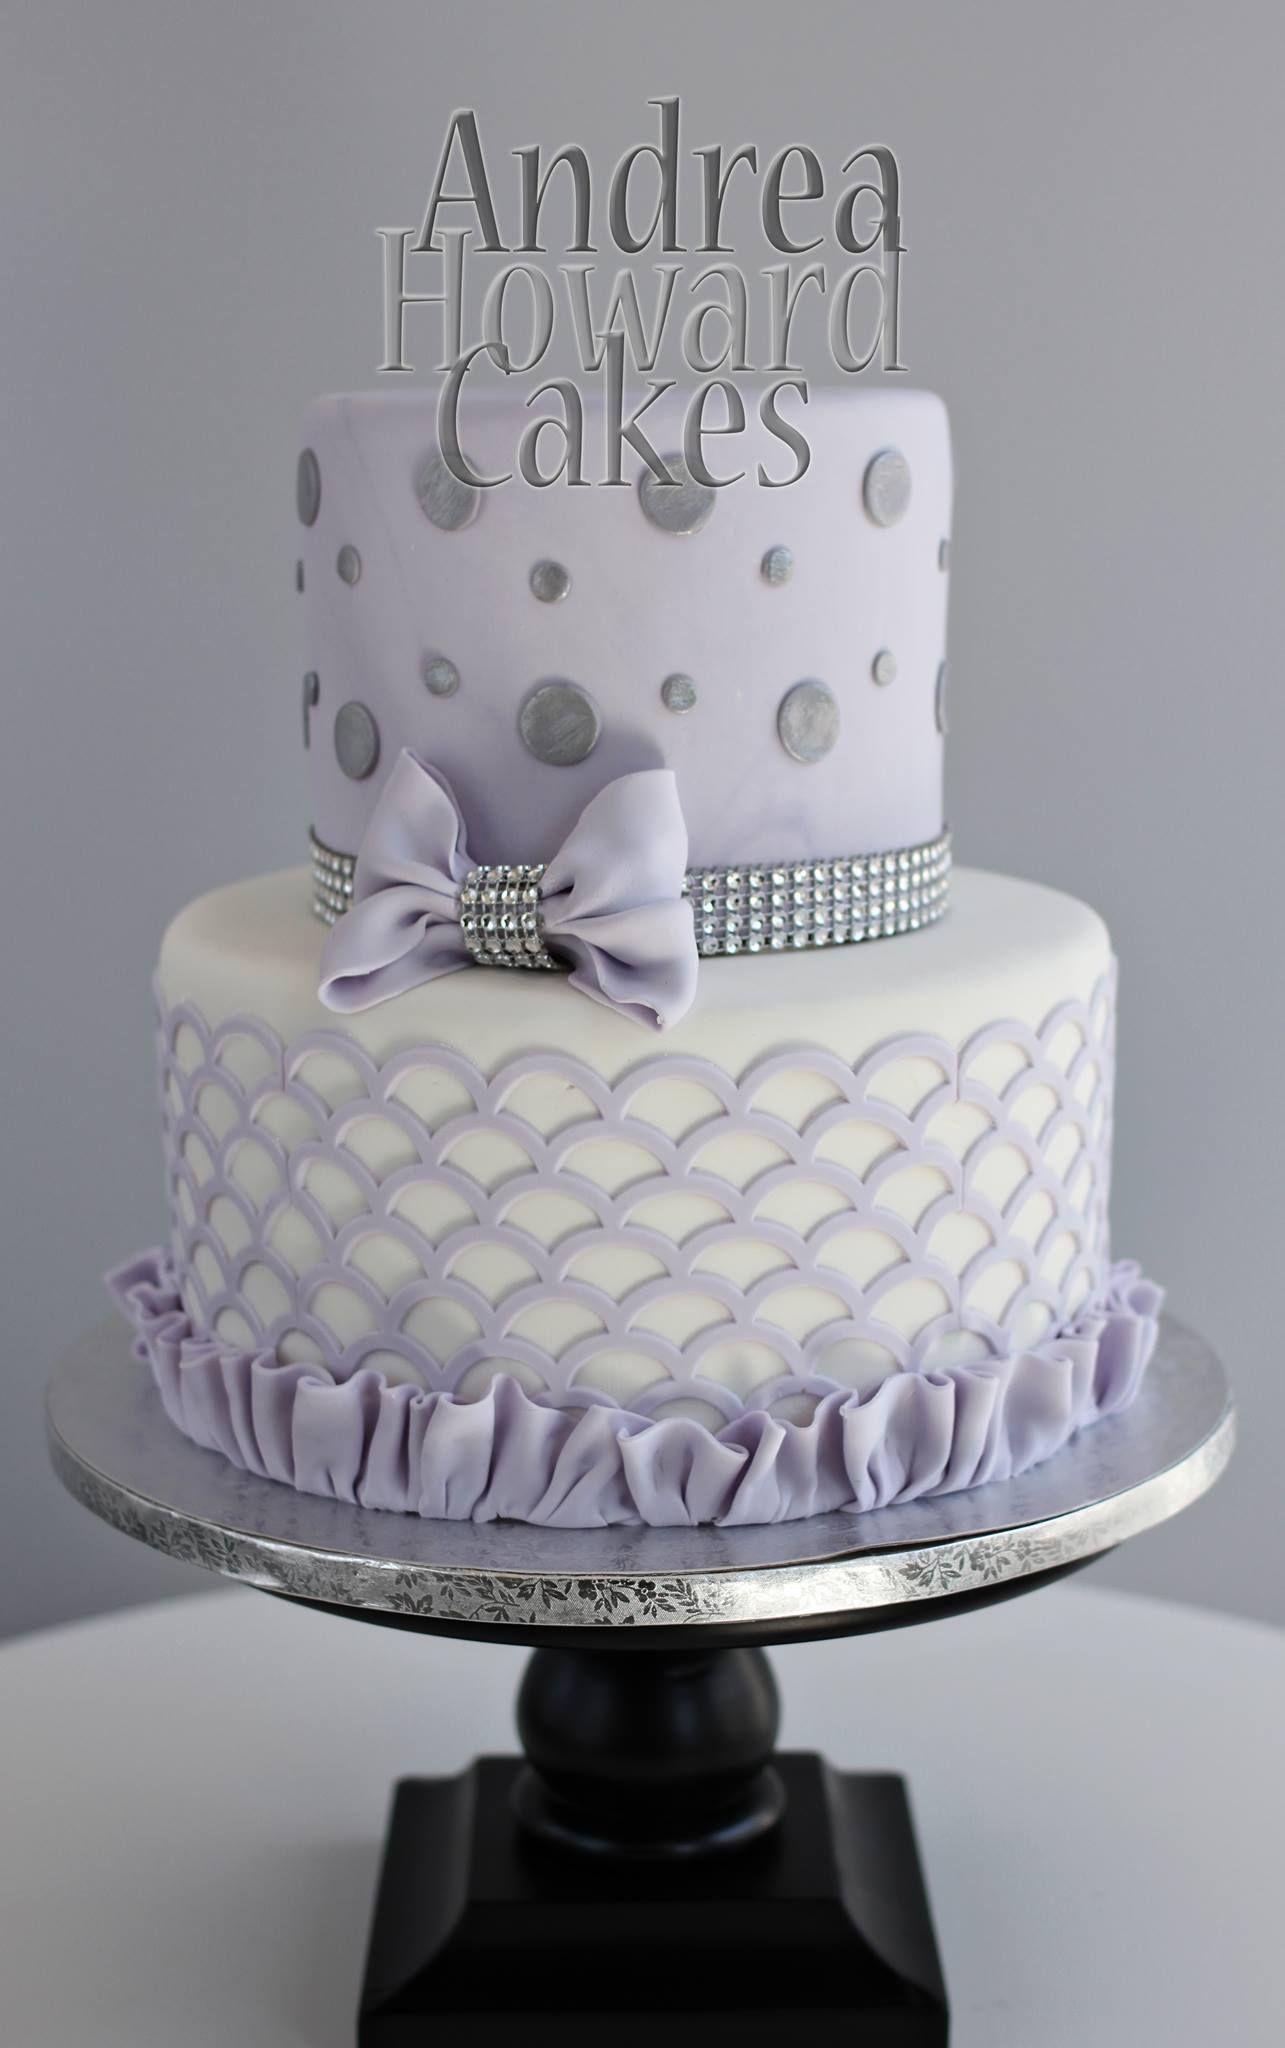 Andrea Howard Cakes Cakes Pinterest Cake Birthday cakes and